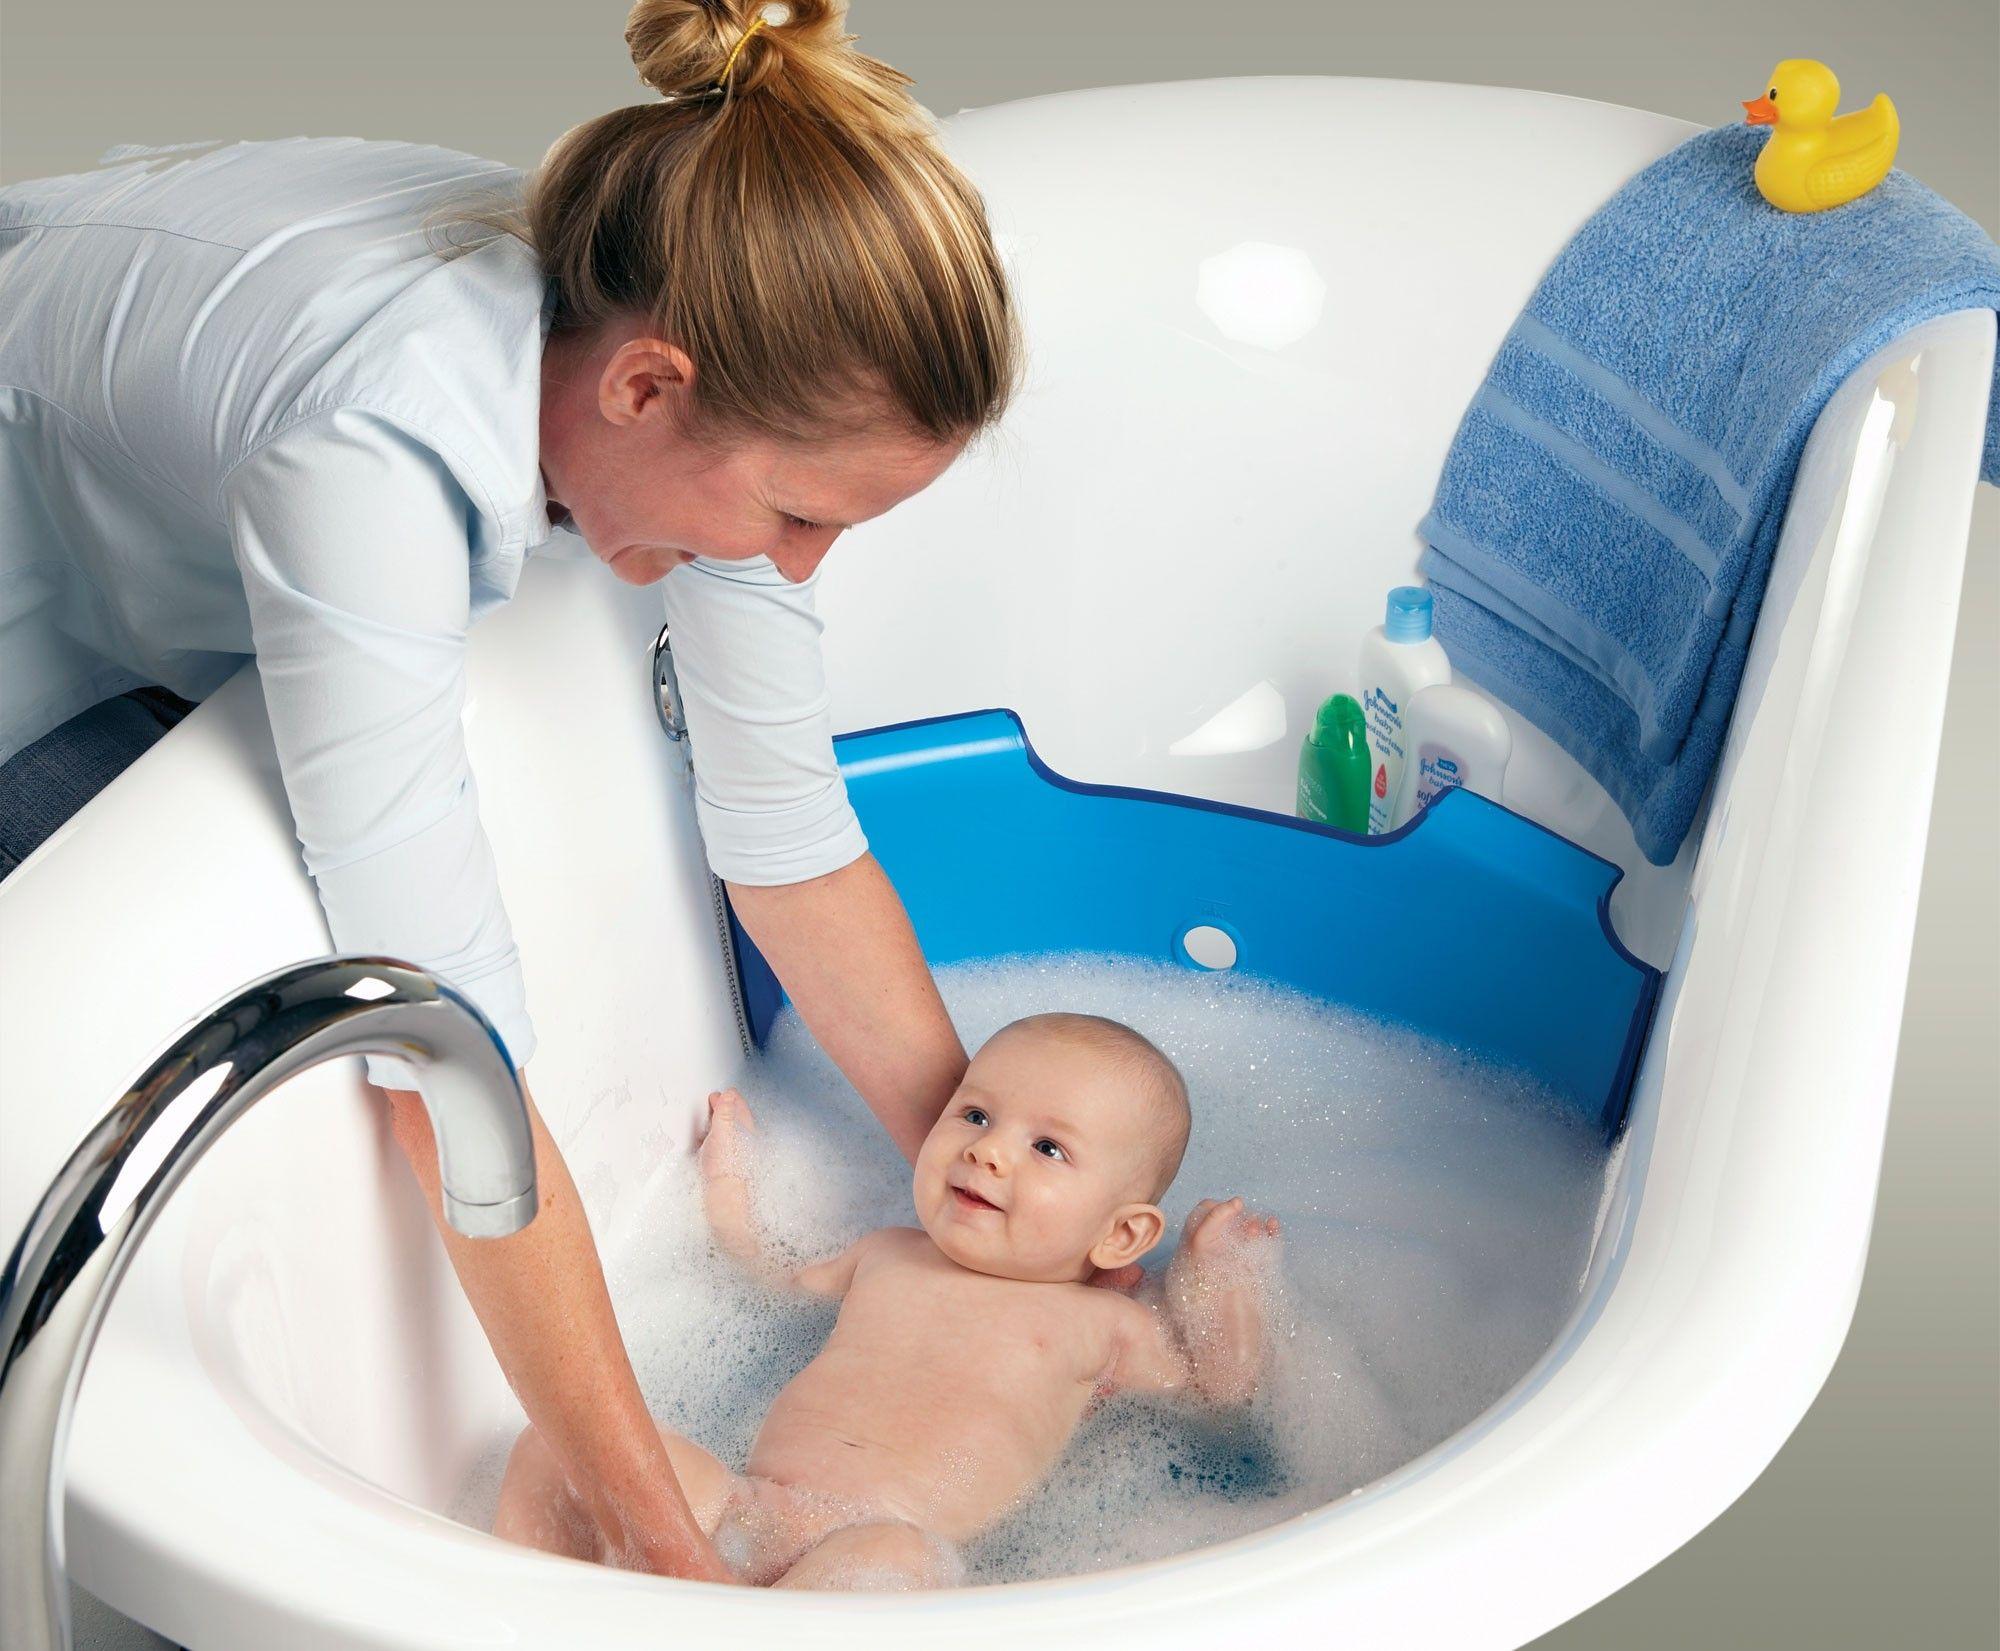 Mamá bañando a su bebé